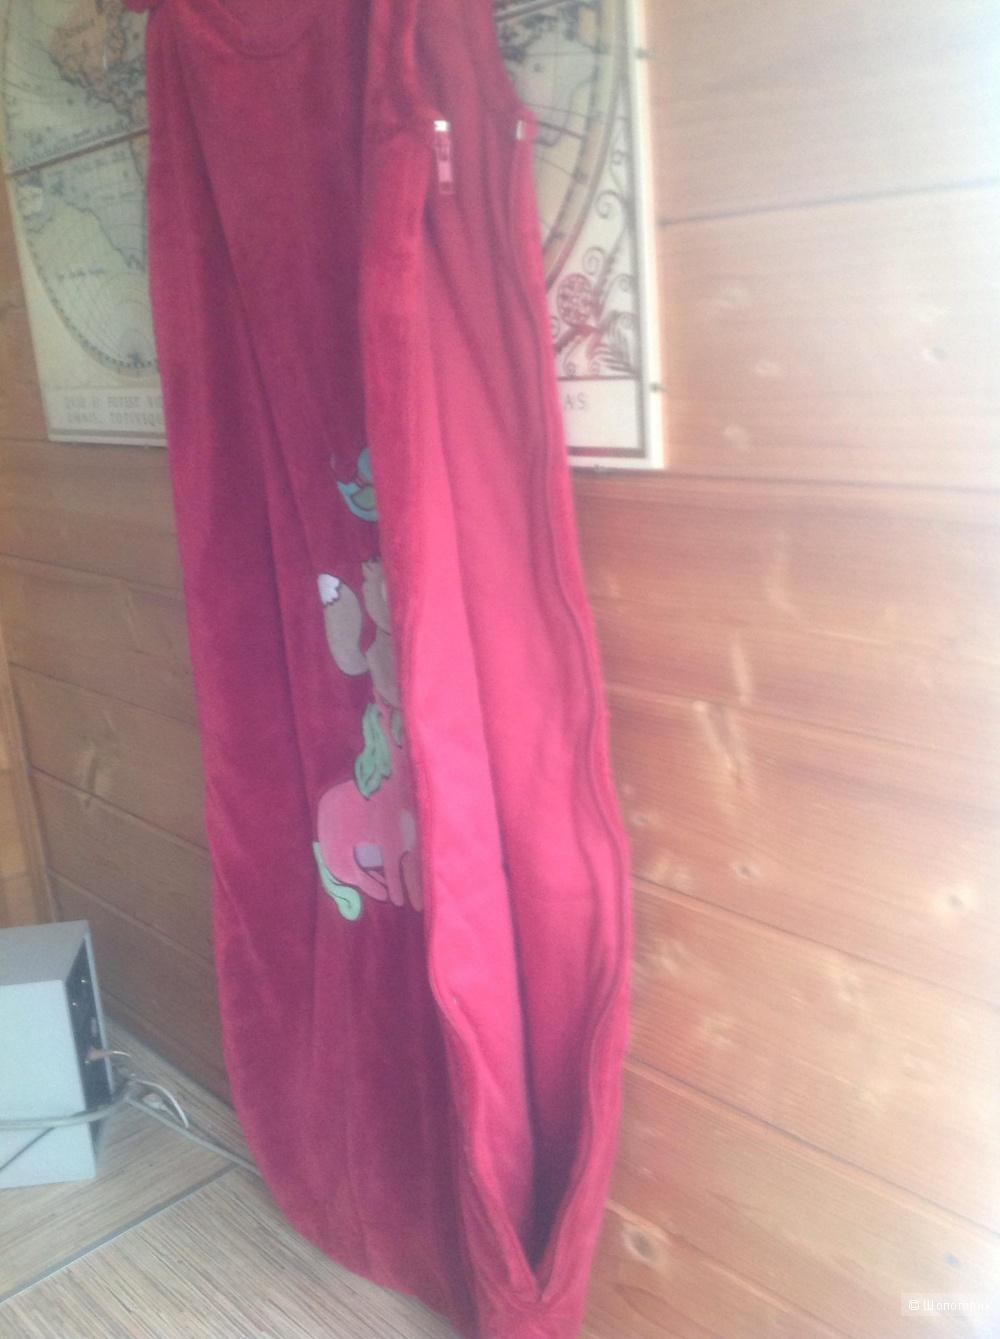 Детский мешок для сна Nonito kids, длина 110 см